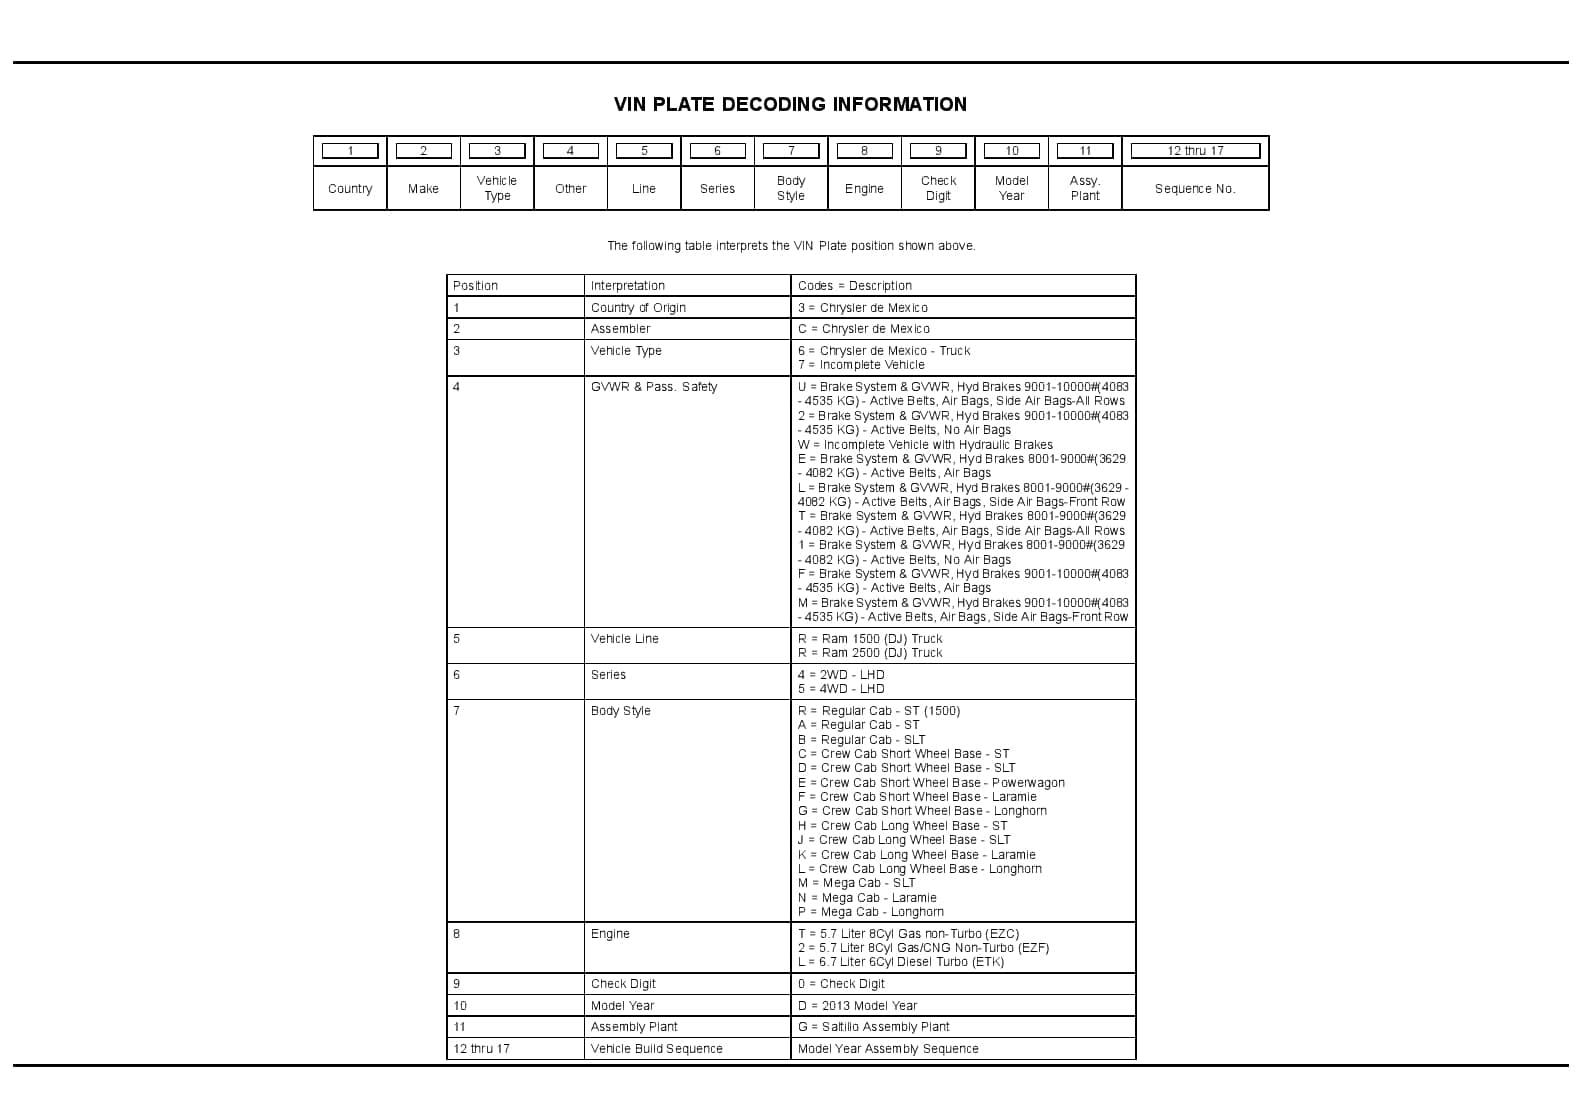 2013 REG & QUAD CAB PICKUP HD Parts Manual PDF Download